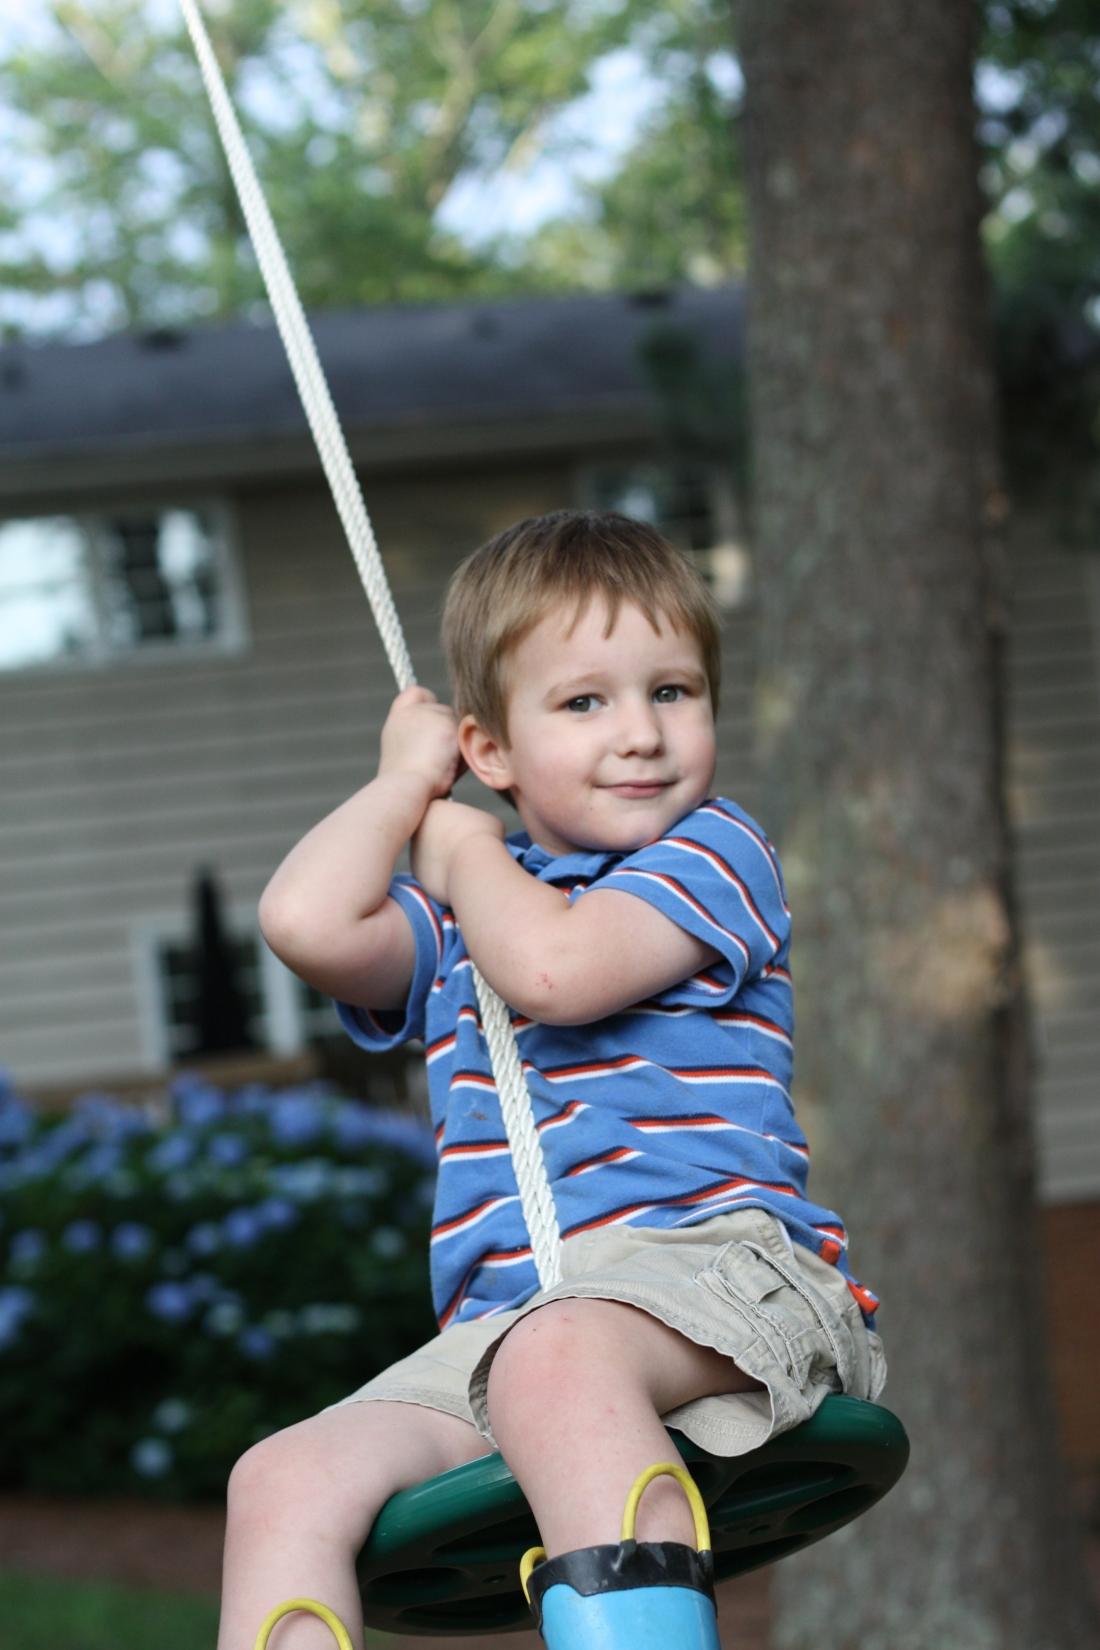 Carlton on the rope swing